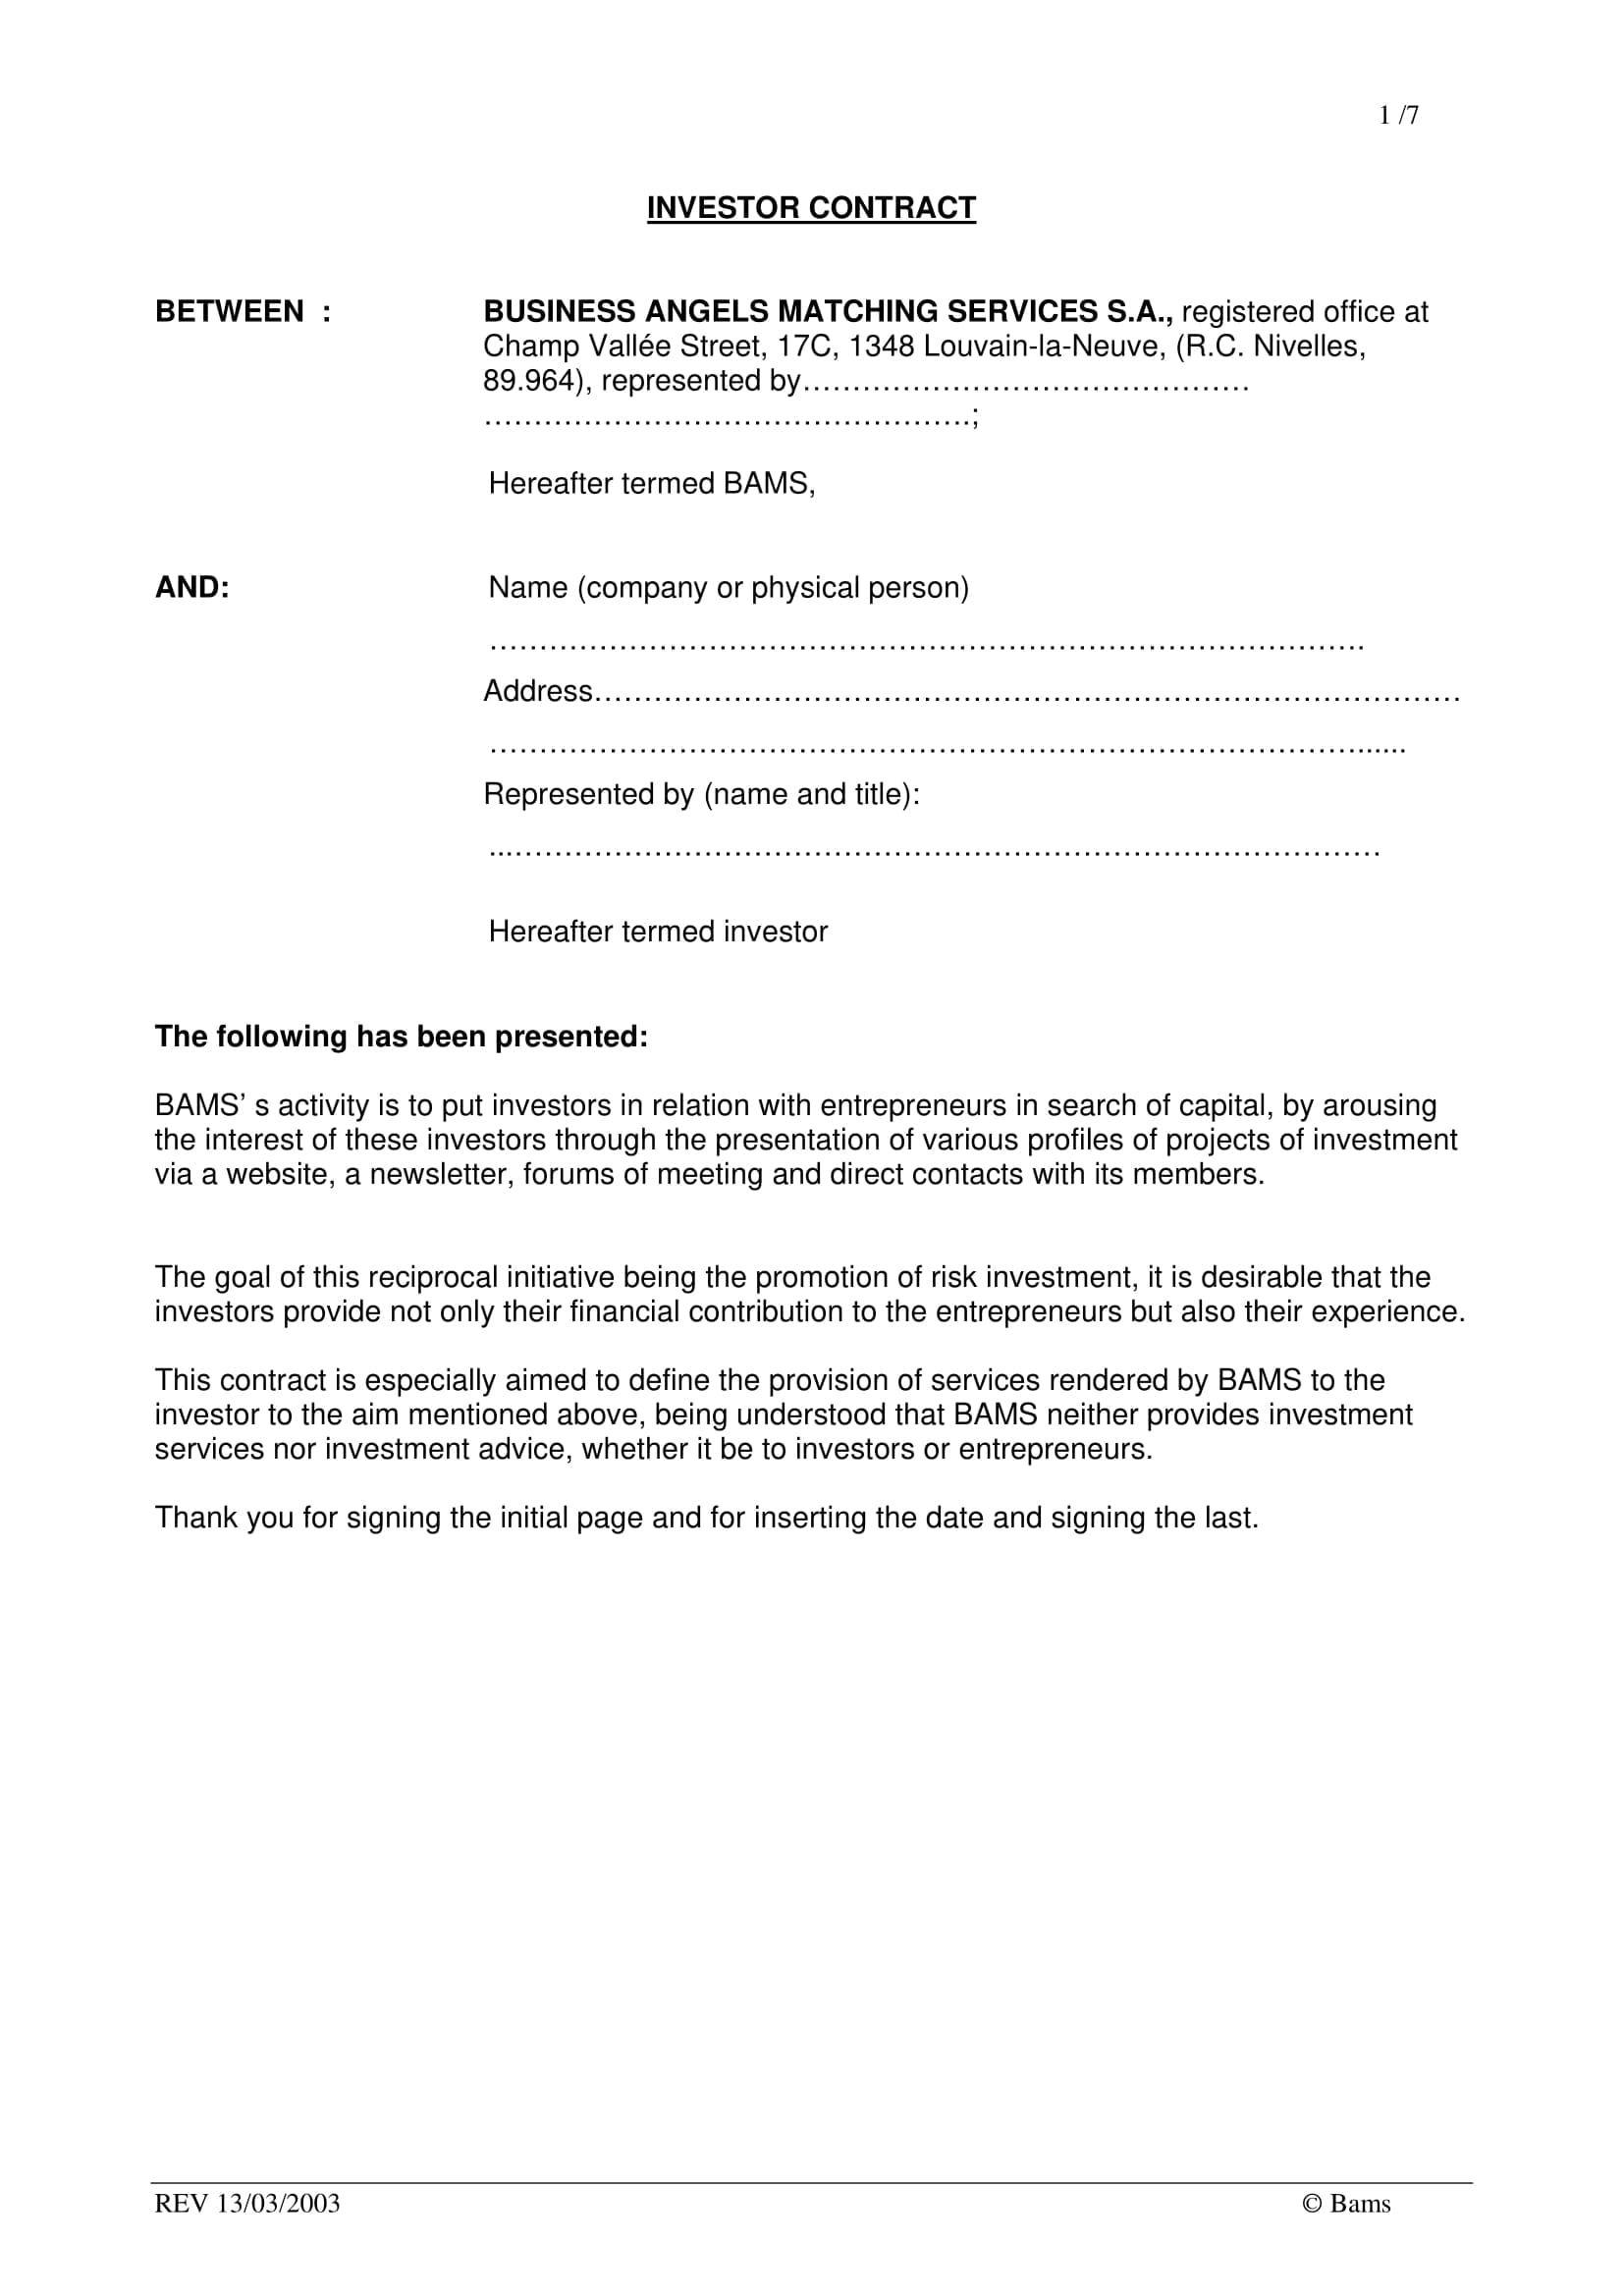 investment contract Kozen